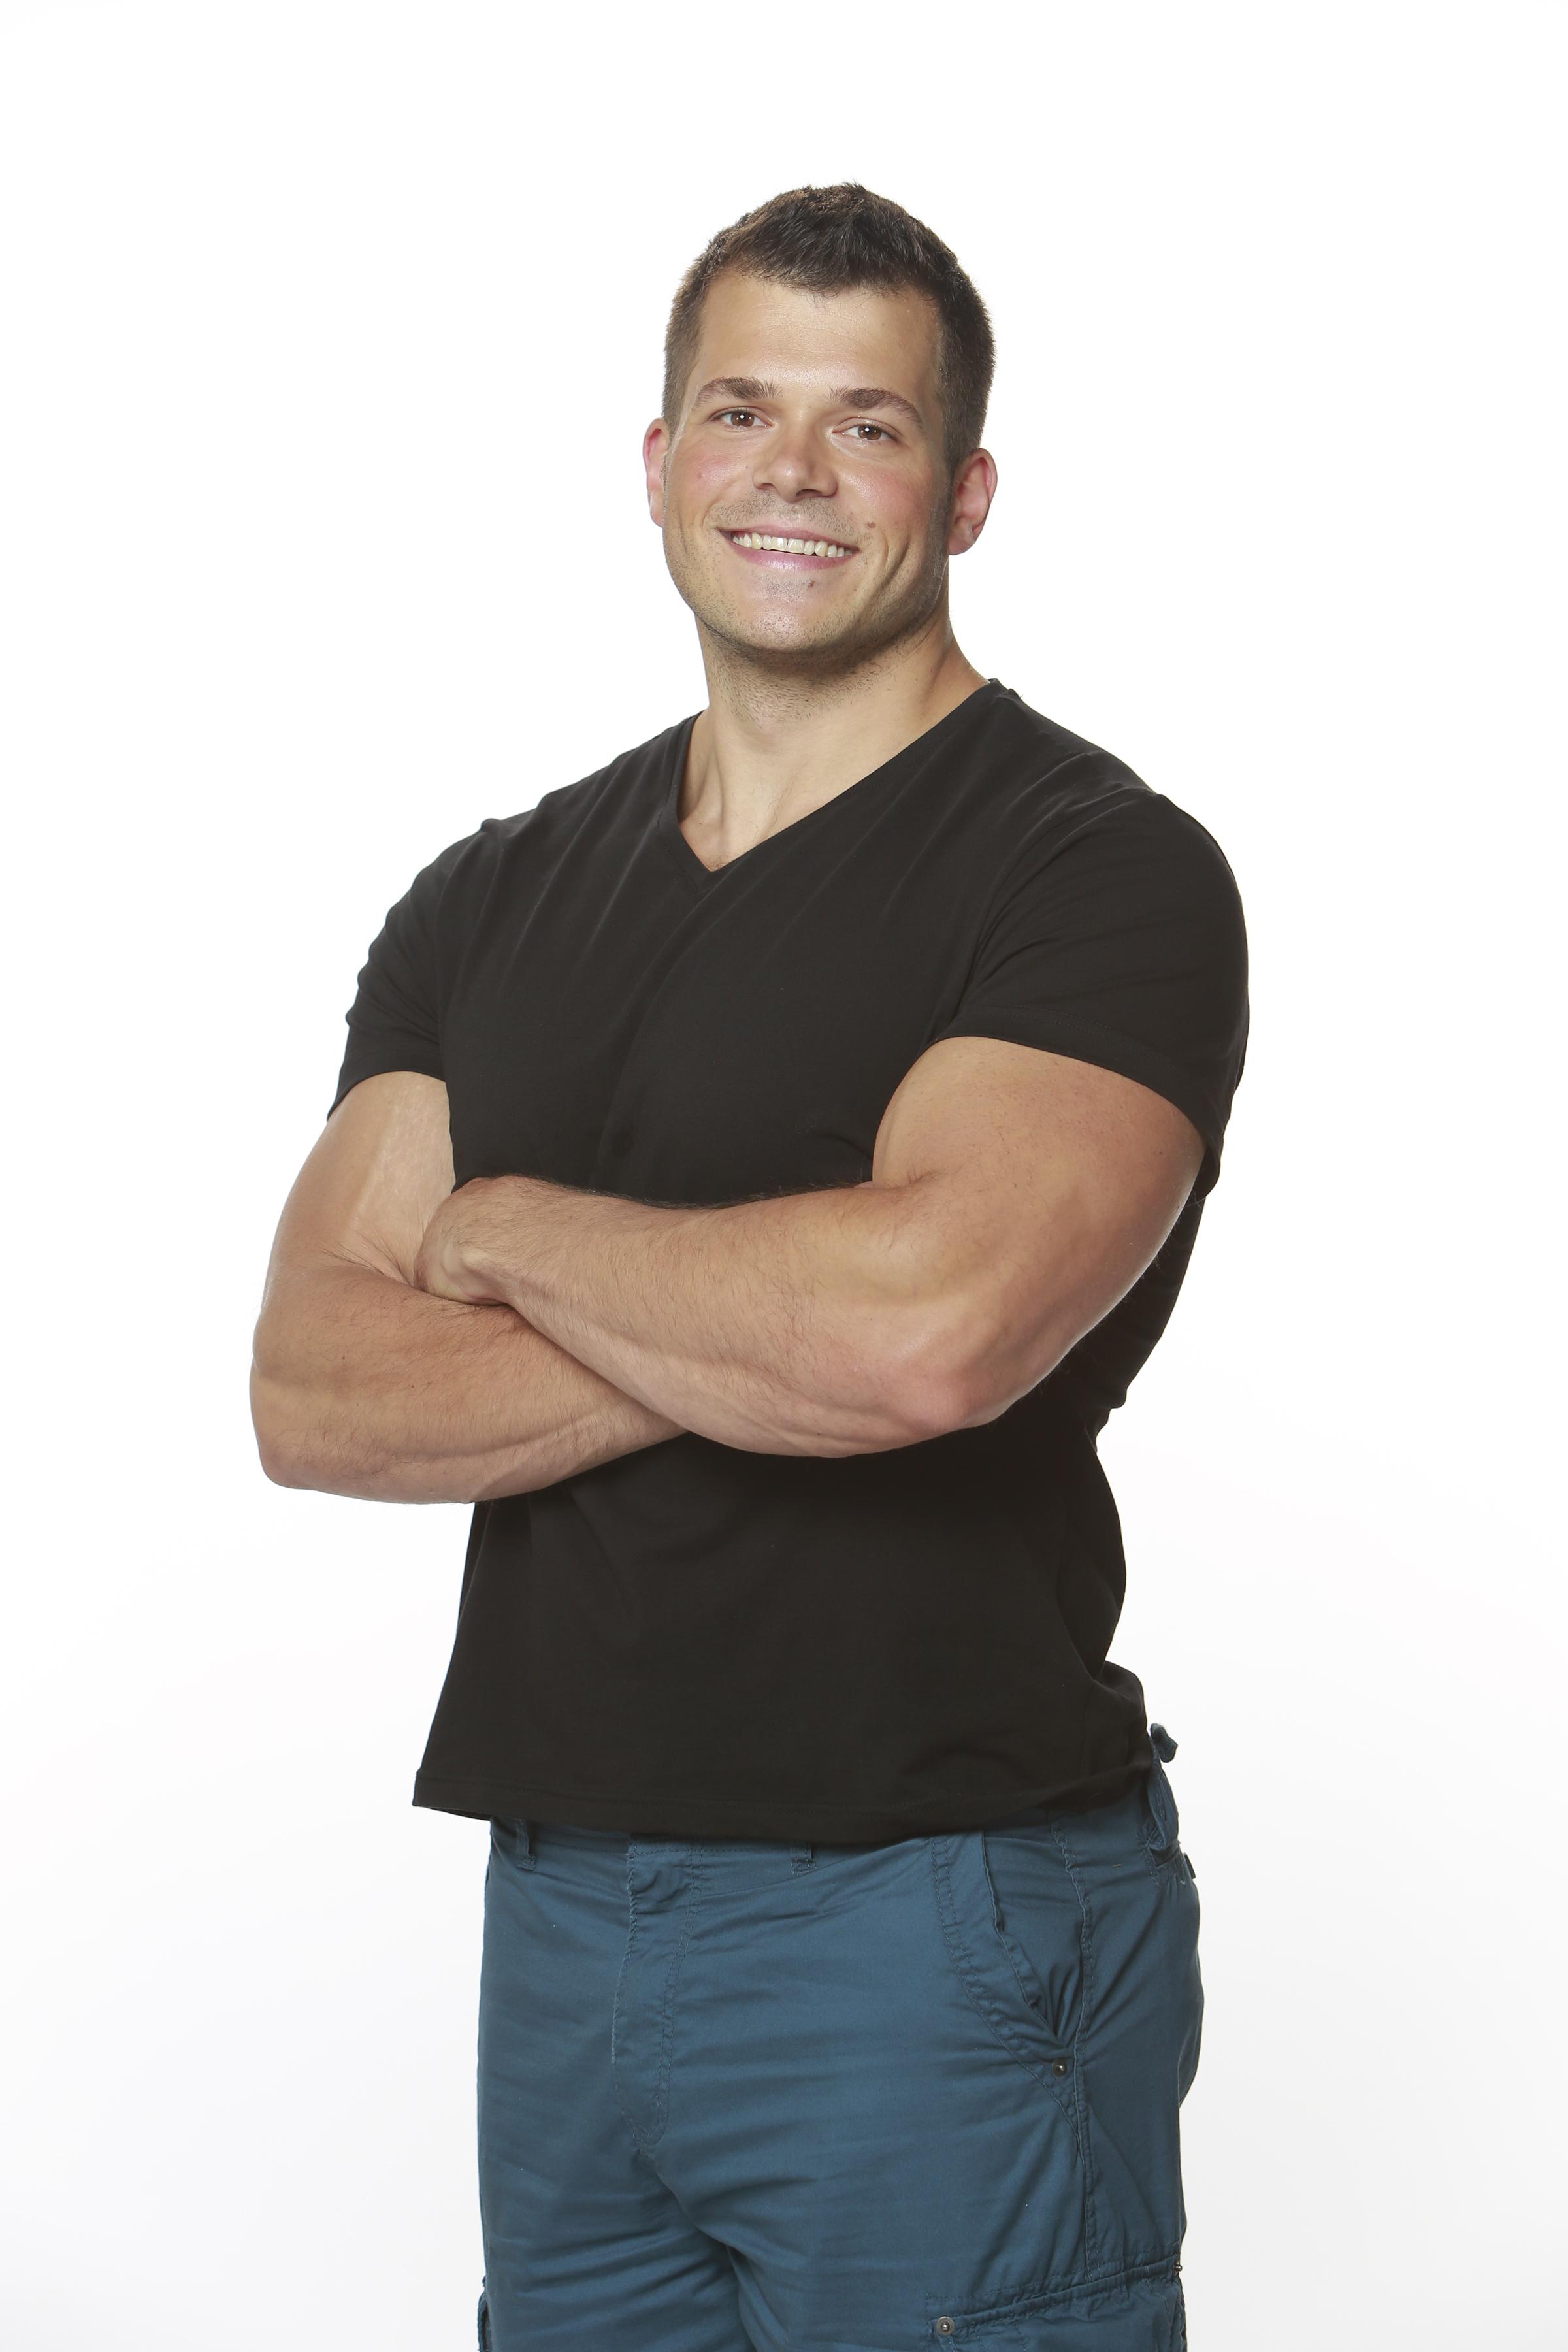 Mark Jansen, 26, Grand Island, N.Y., personal trainer